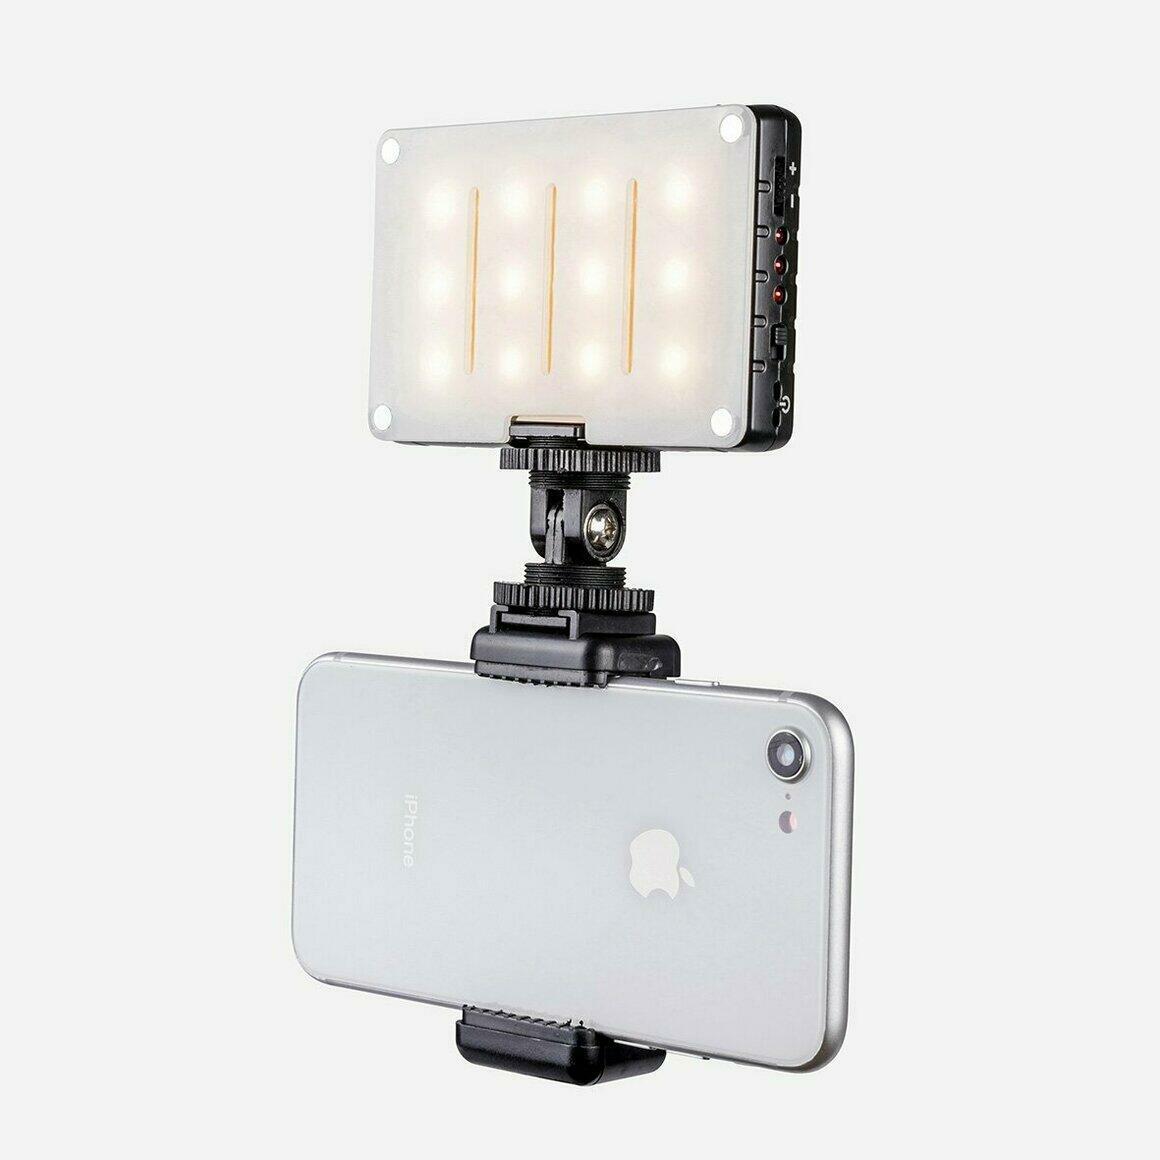 Pictar Smart light   Trada Marketplace